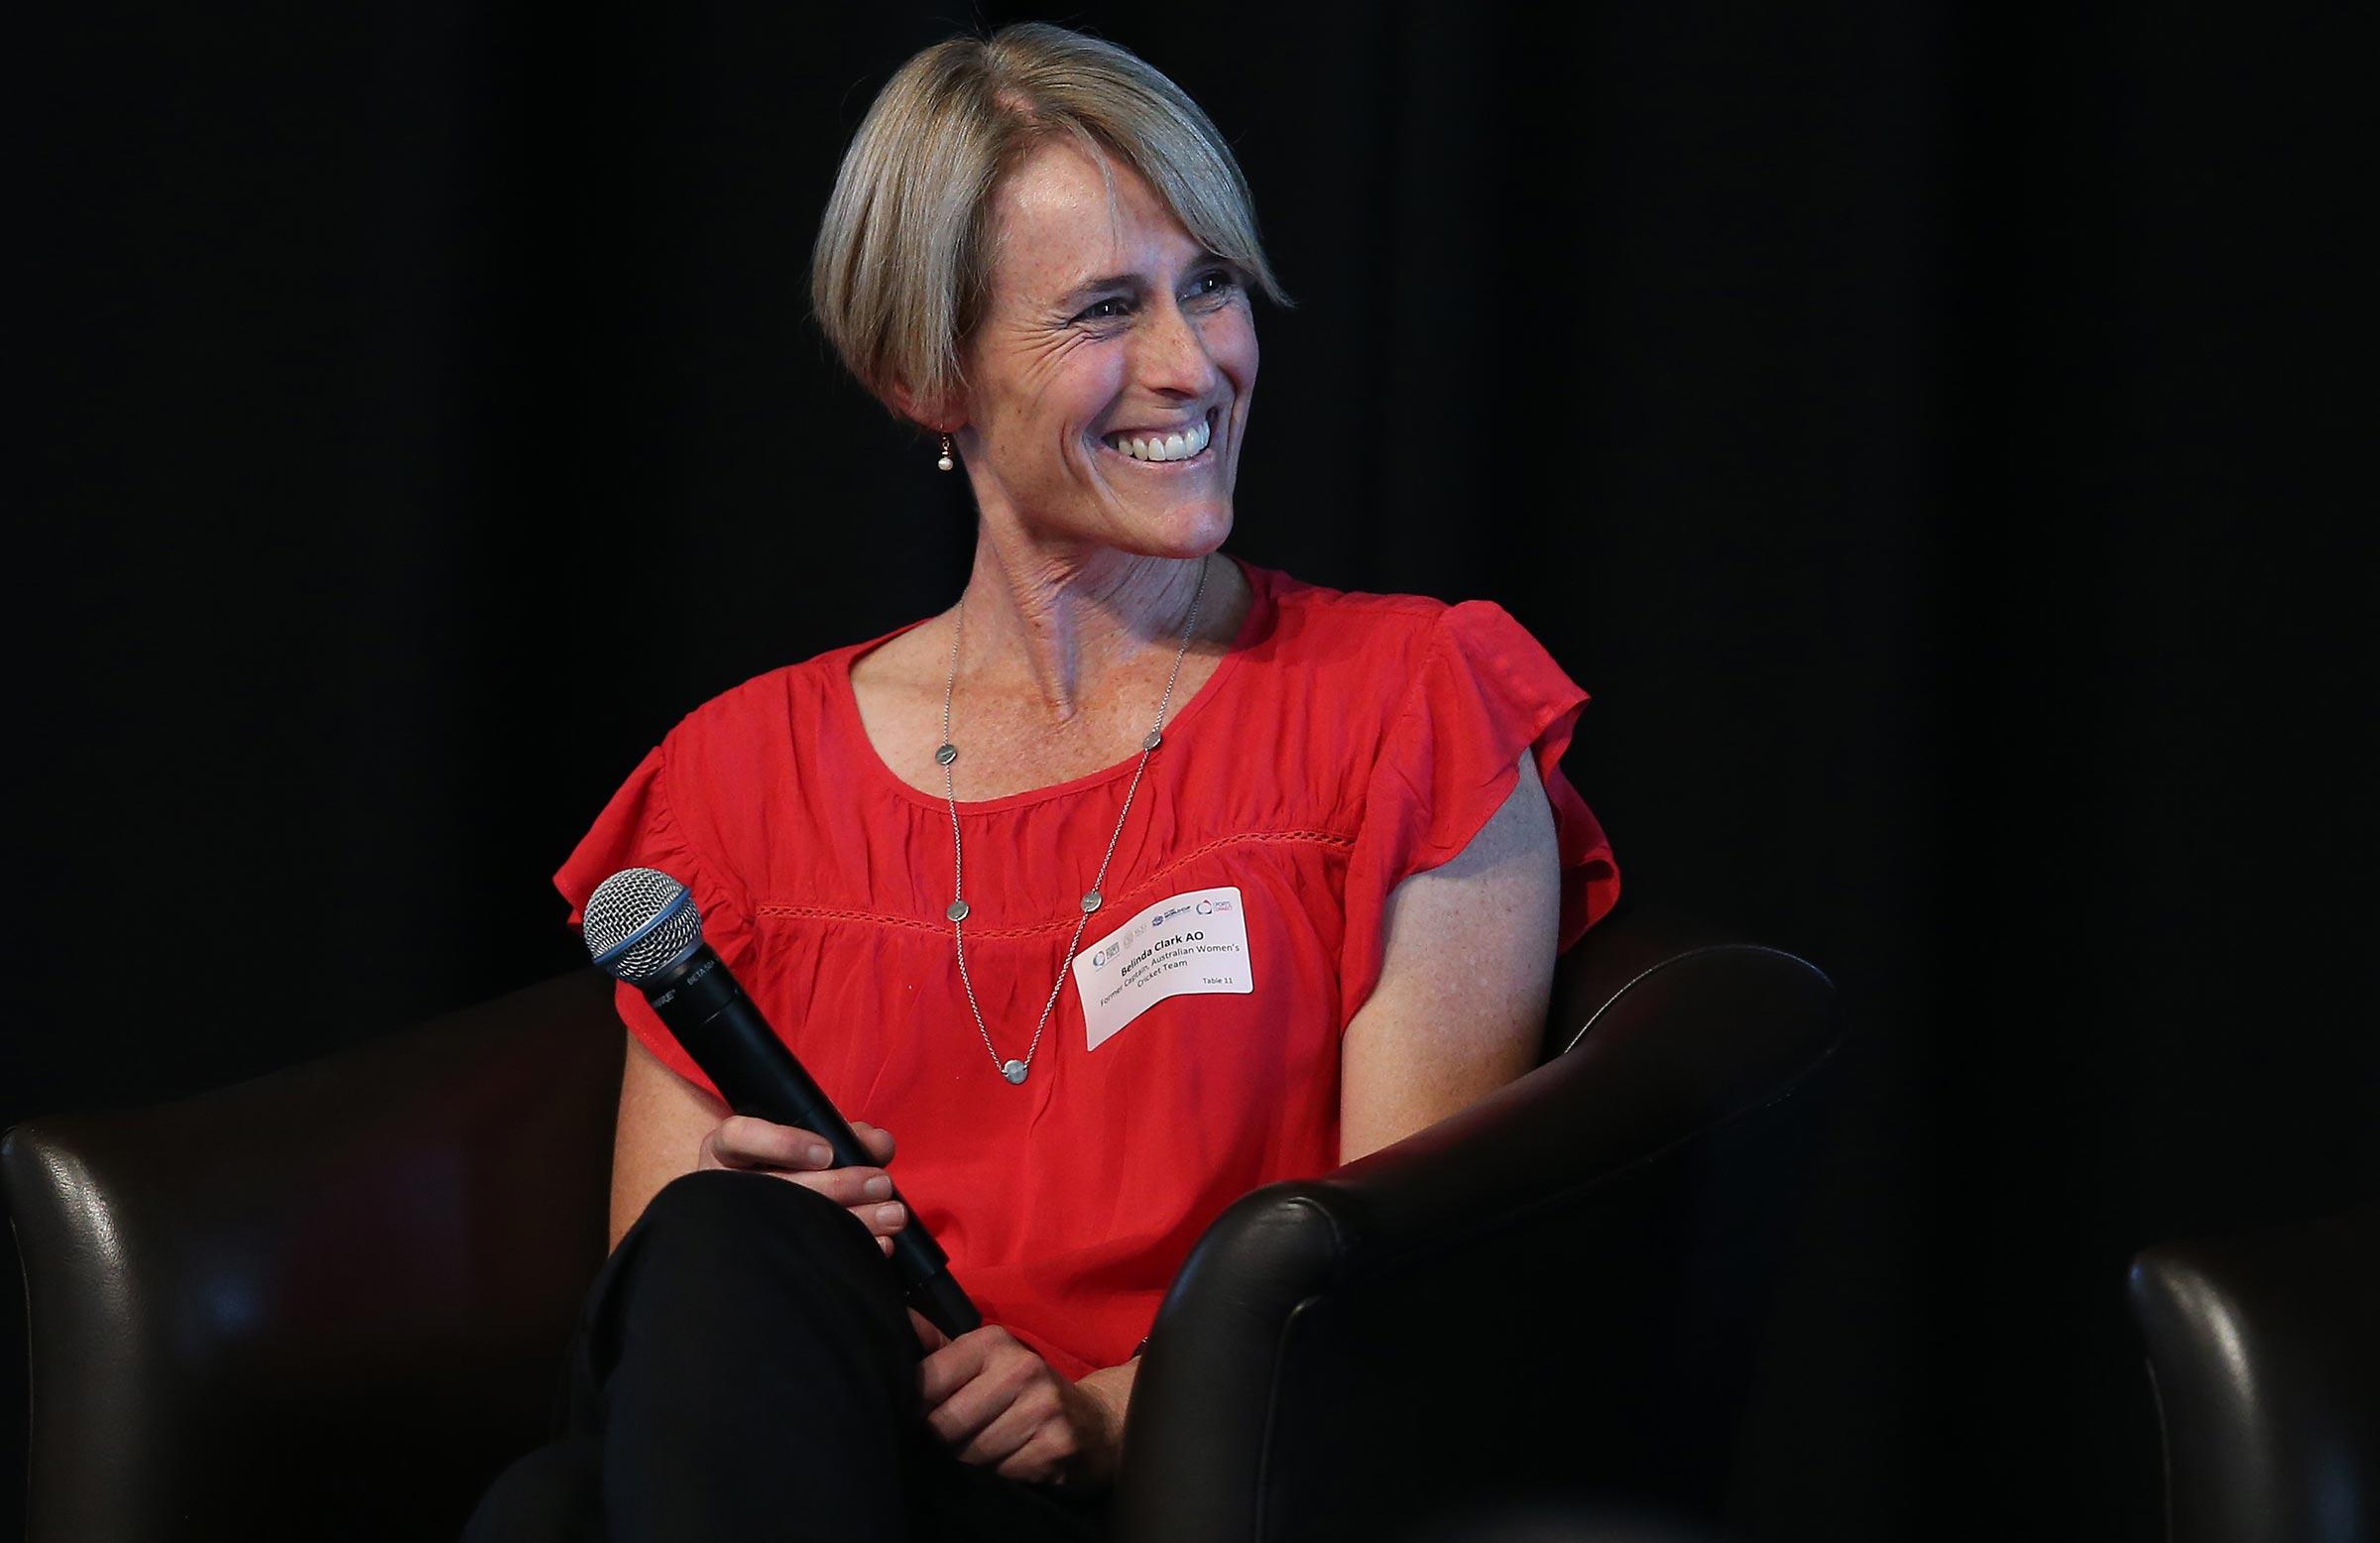 Belinda Clark has been a key sounding board for Molineux // Getty